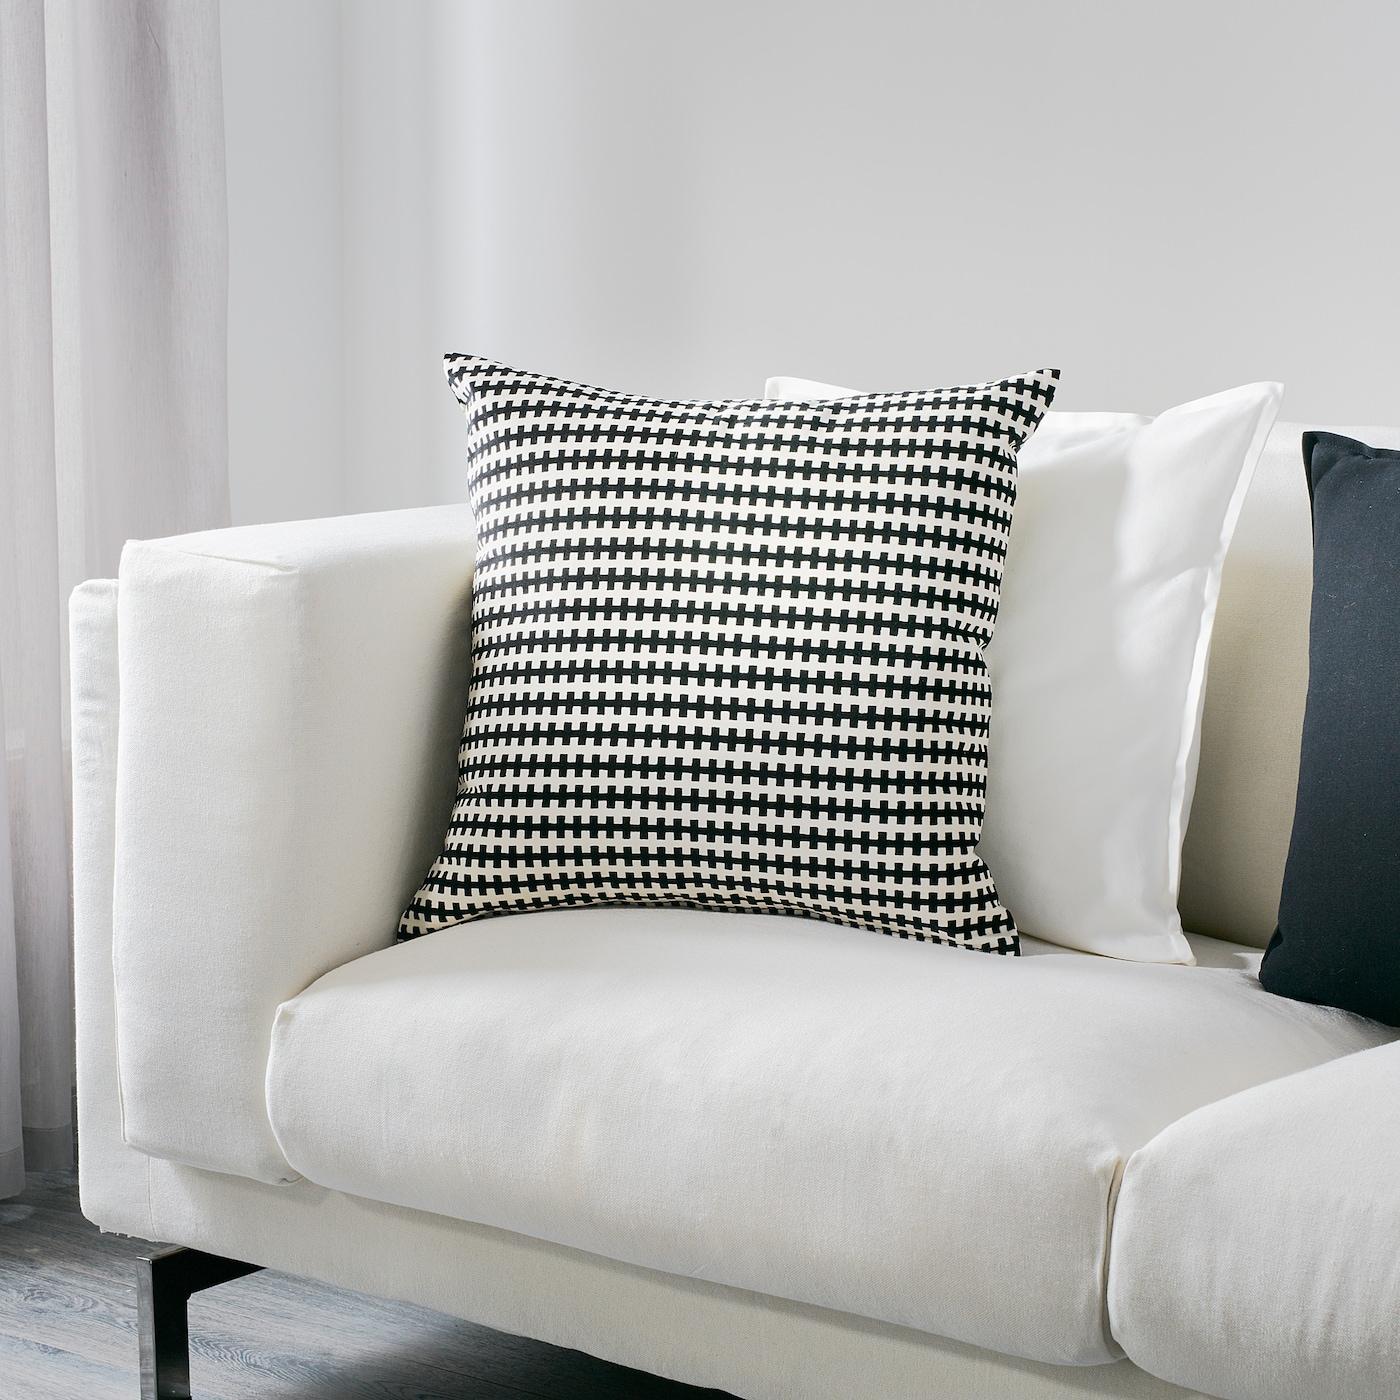 IKEA Skarvfro Cushion Black White 12x24 004.258.38